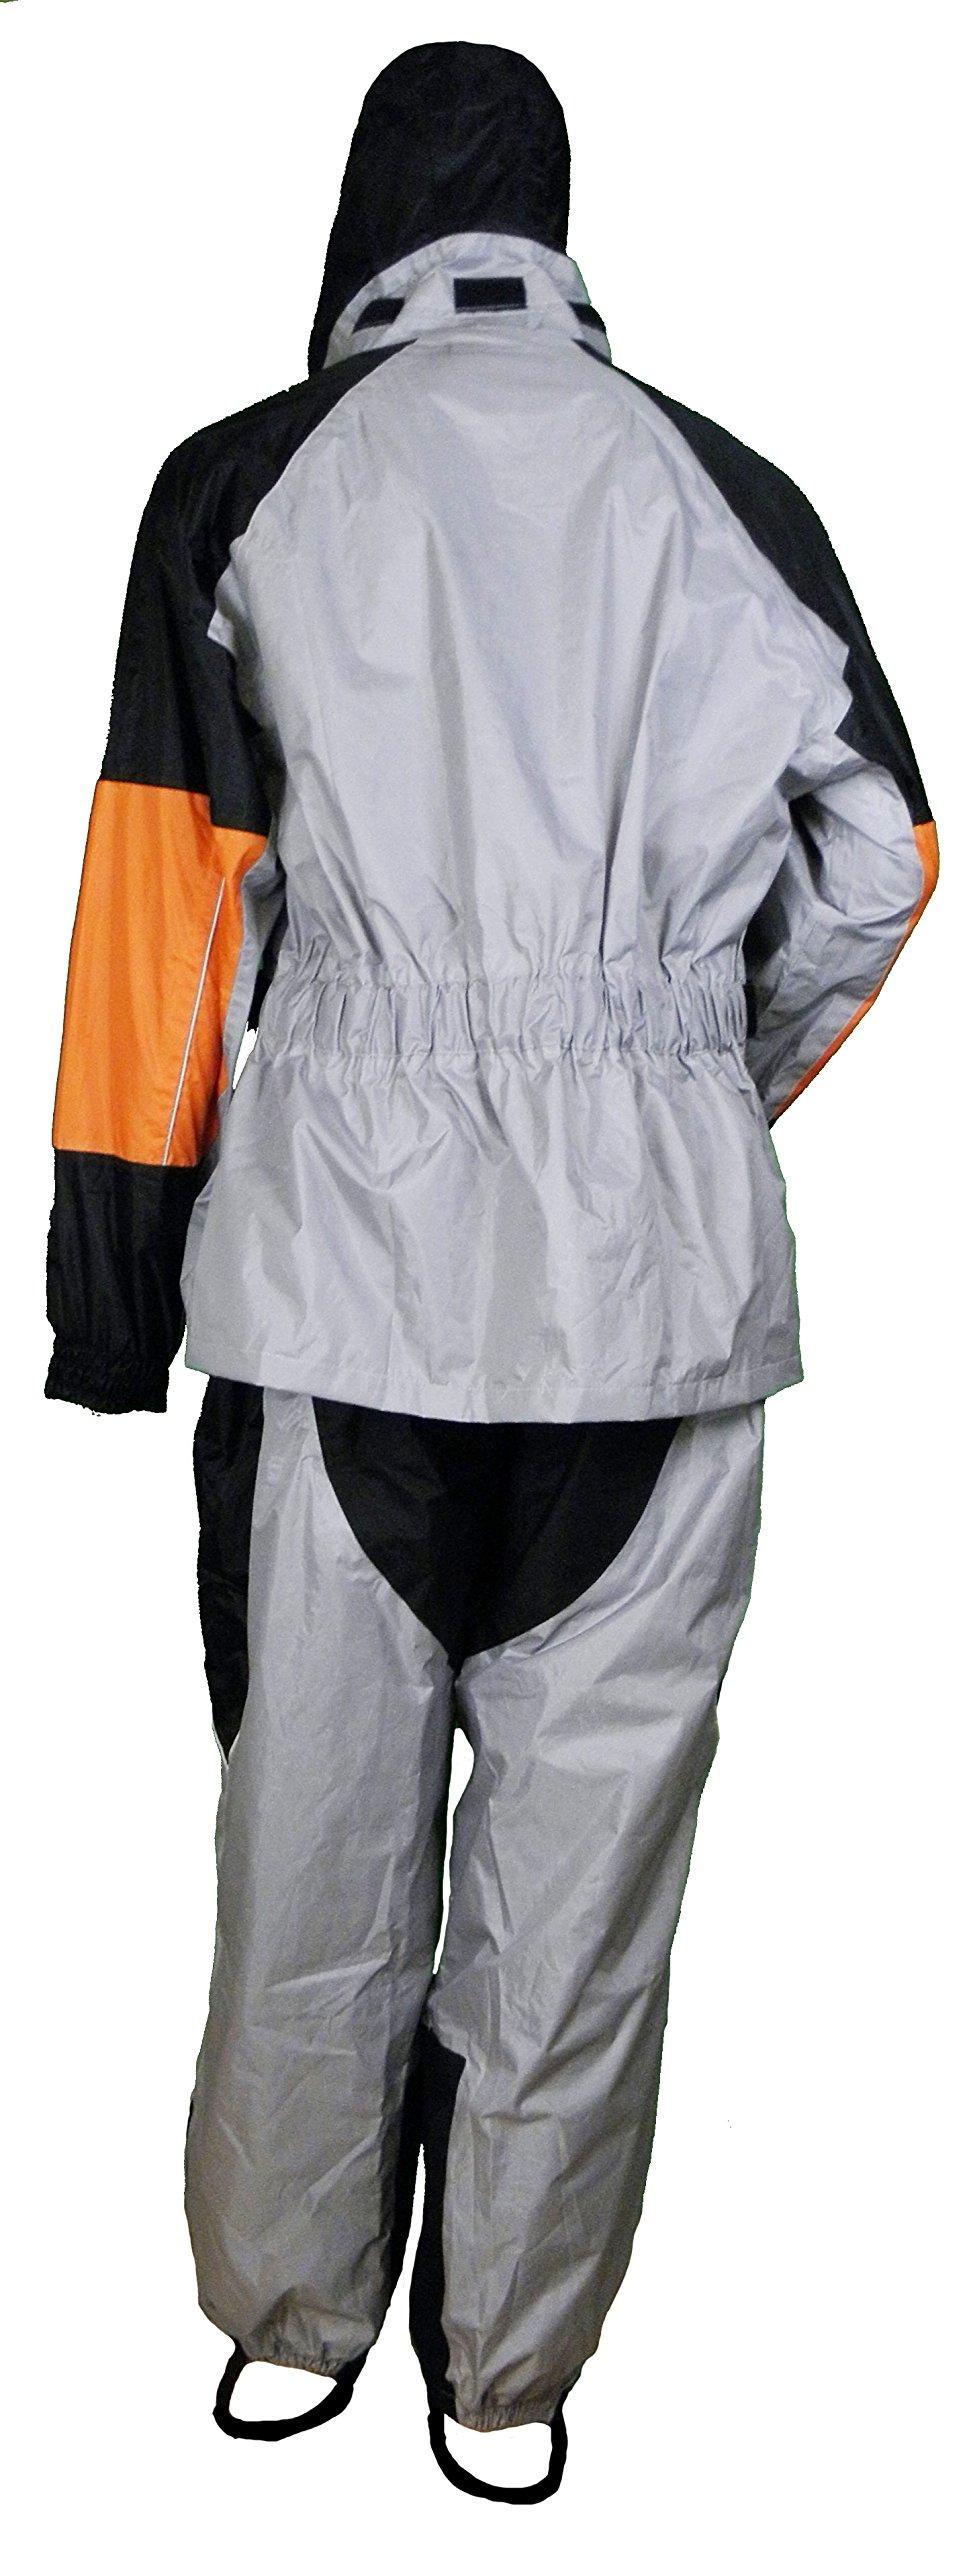 Premium Rainsuit Black/Gray & Orange by Vance Leather (Image #1)